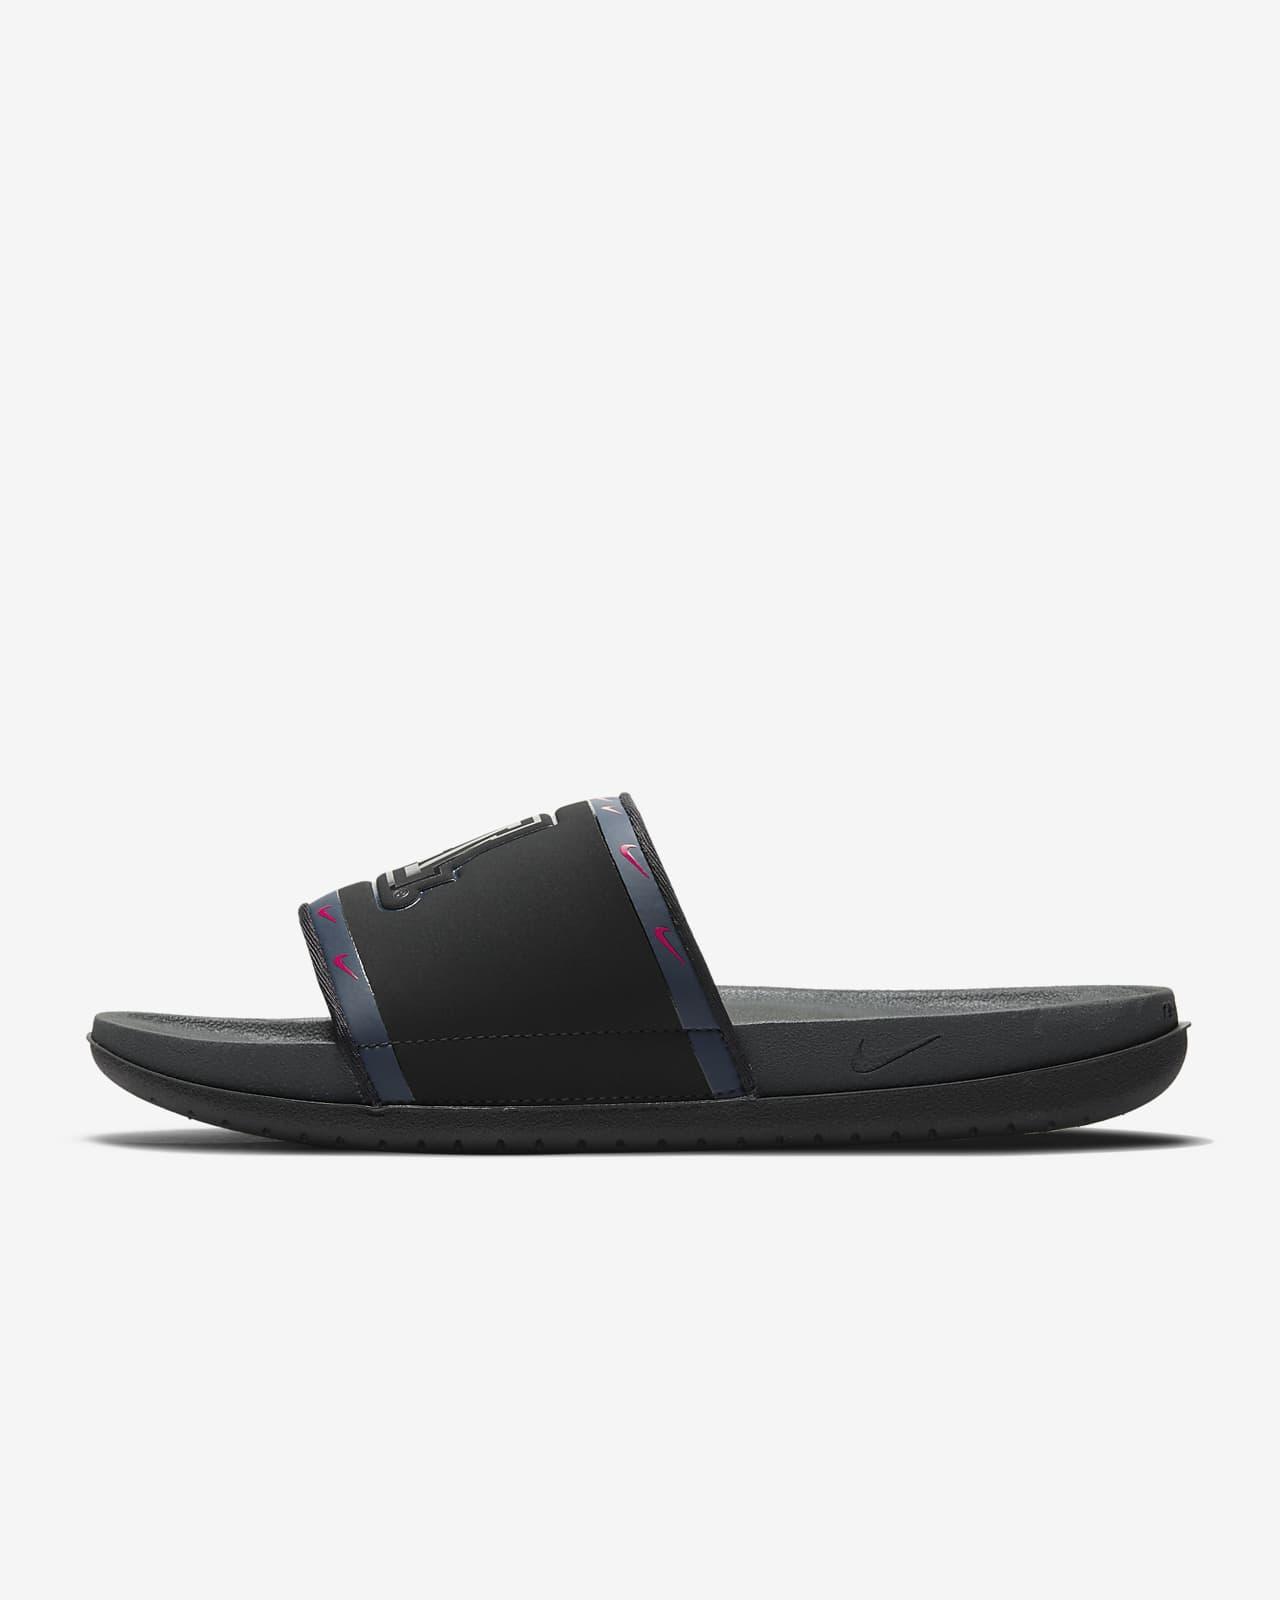 Nike Offcourt (Arizona) Slide